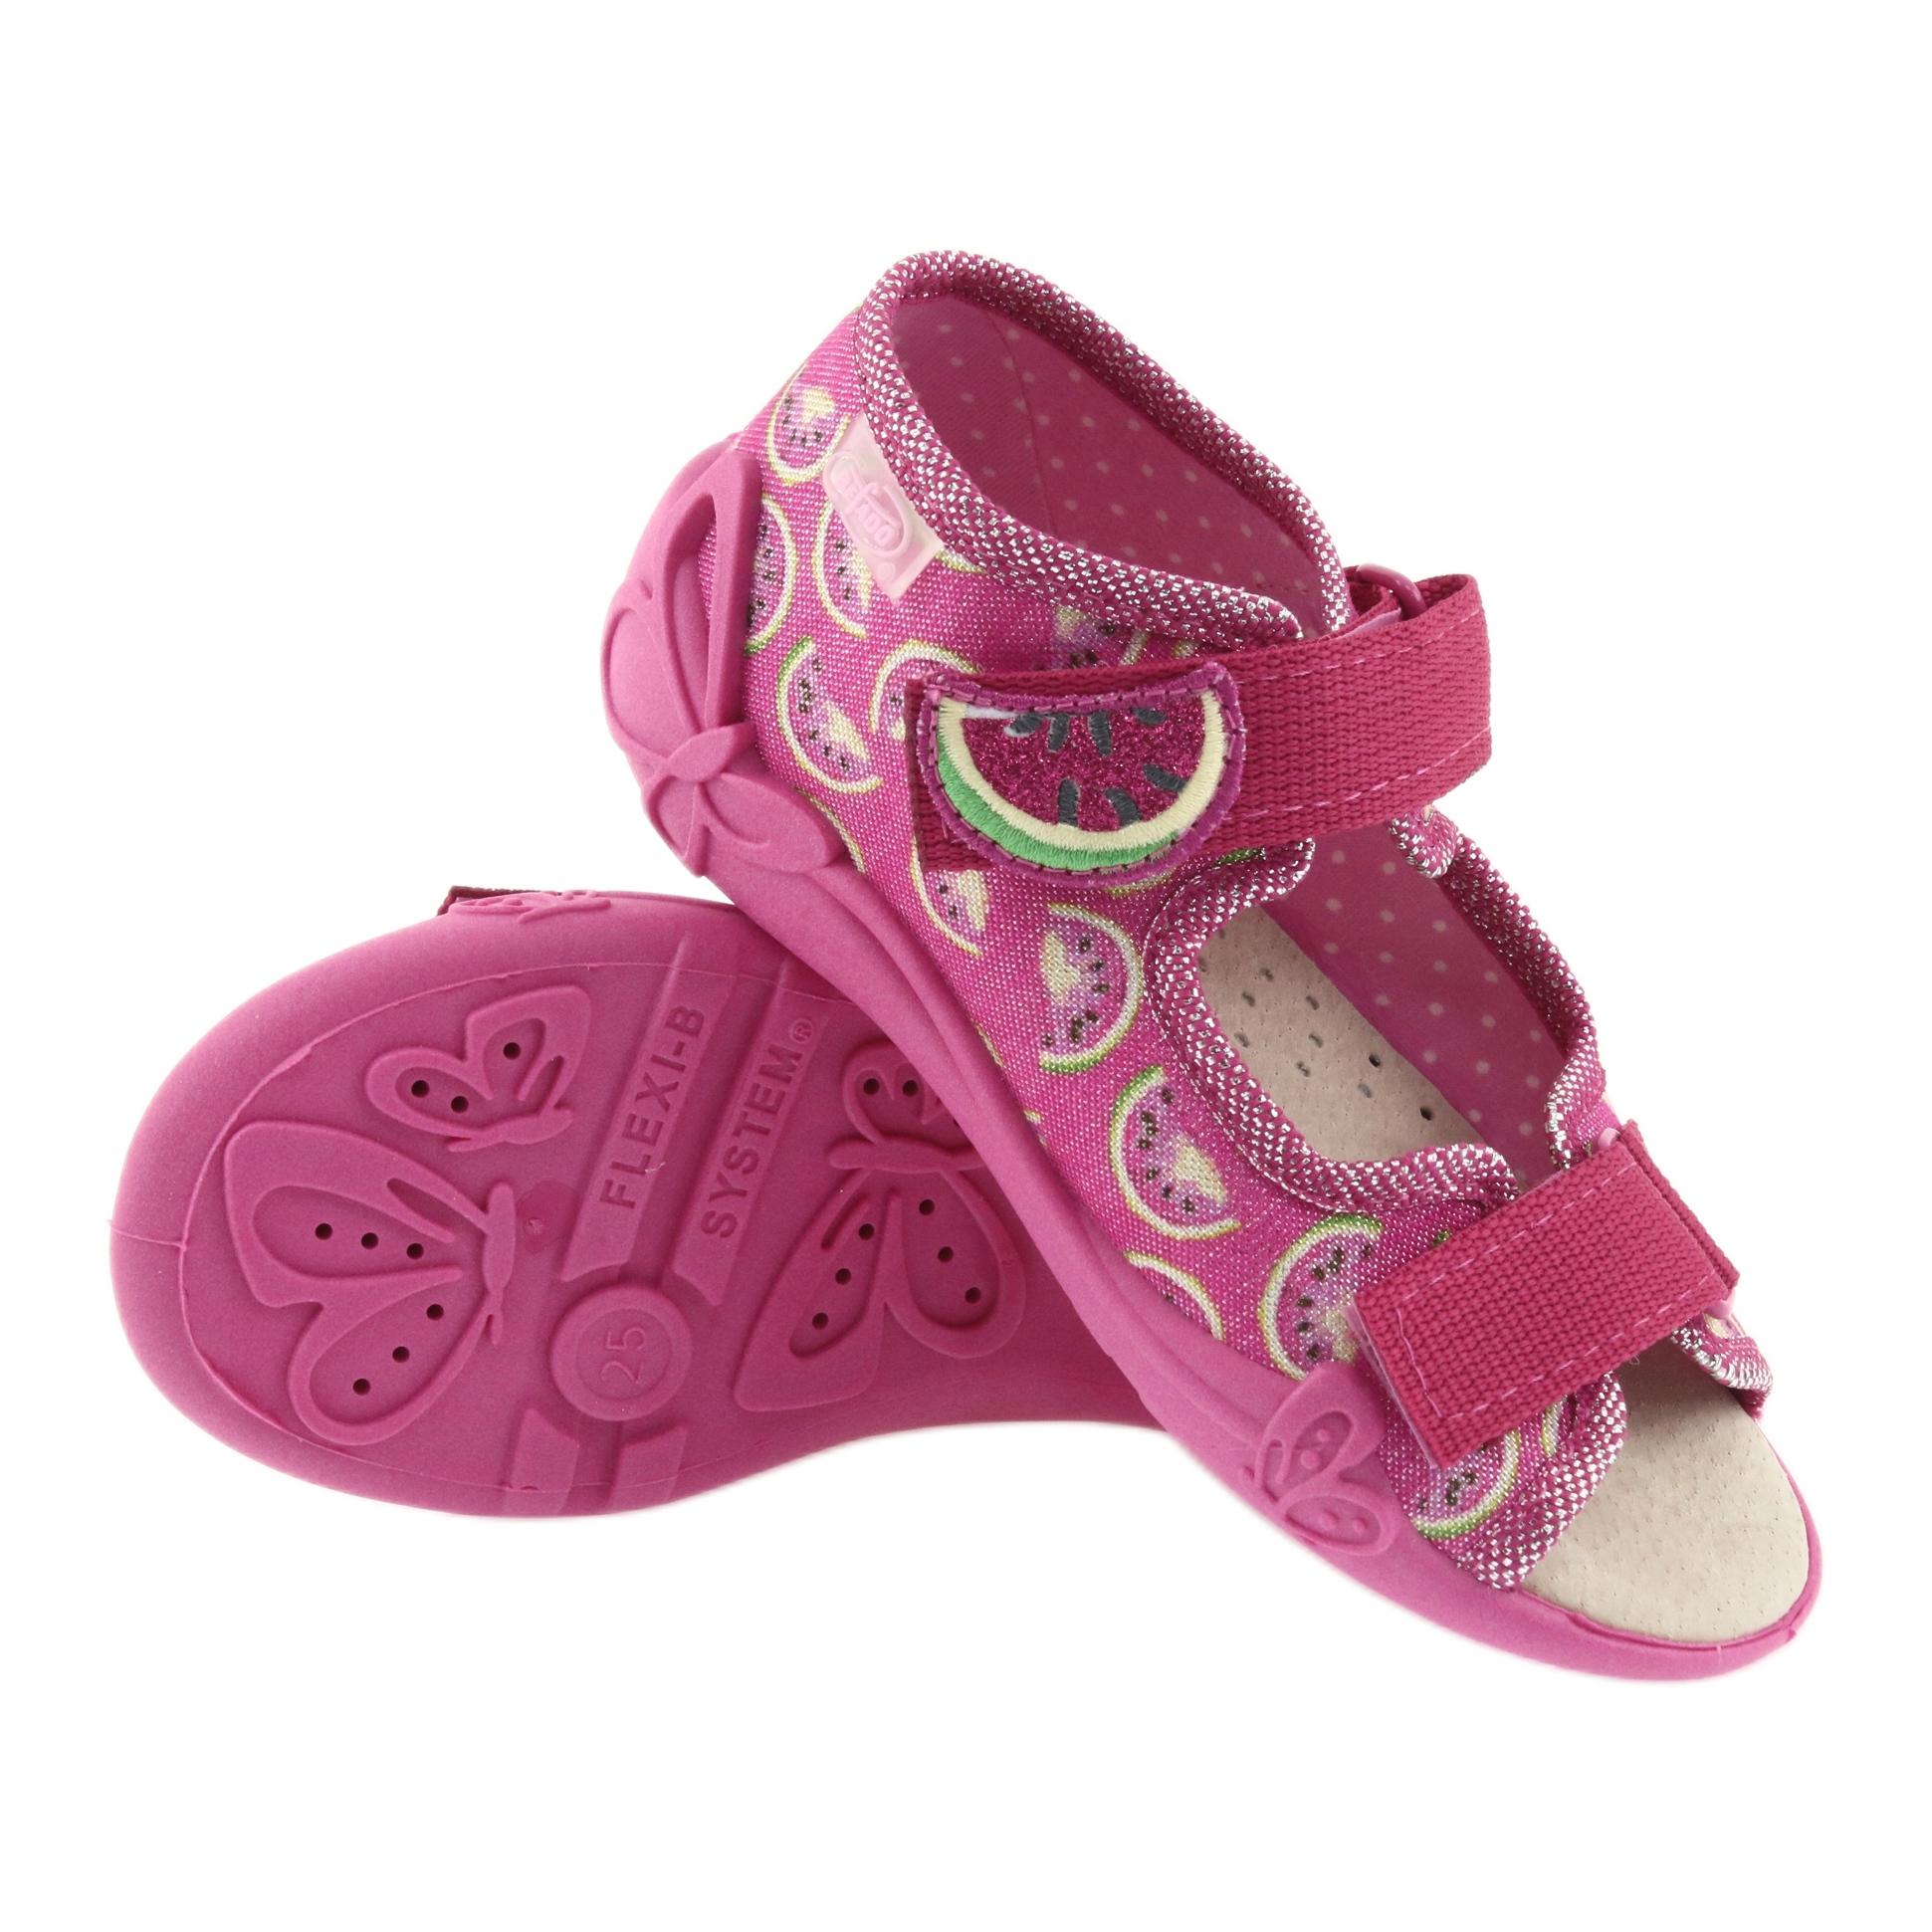 miniatura 4 - Sandali Befado scarpe da bambino 342P004 angurie grigio verde giallo rosa